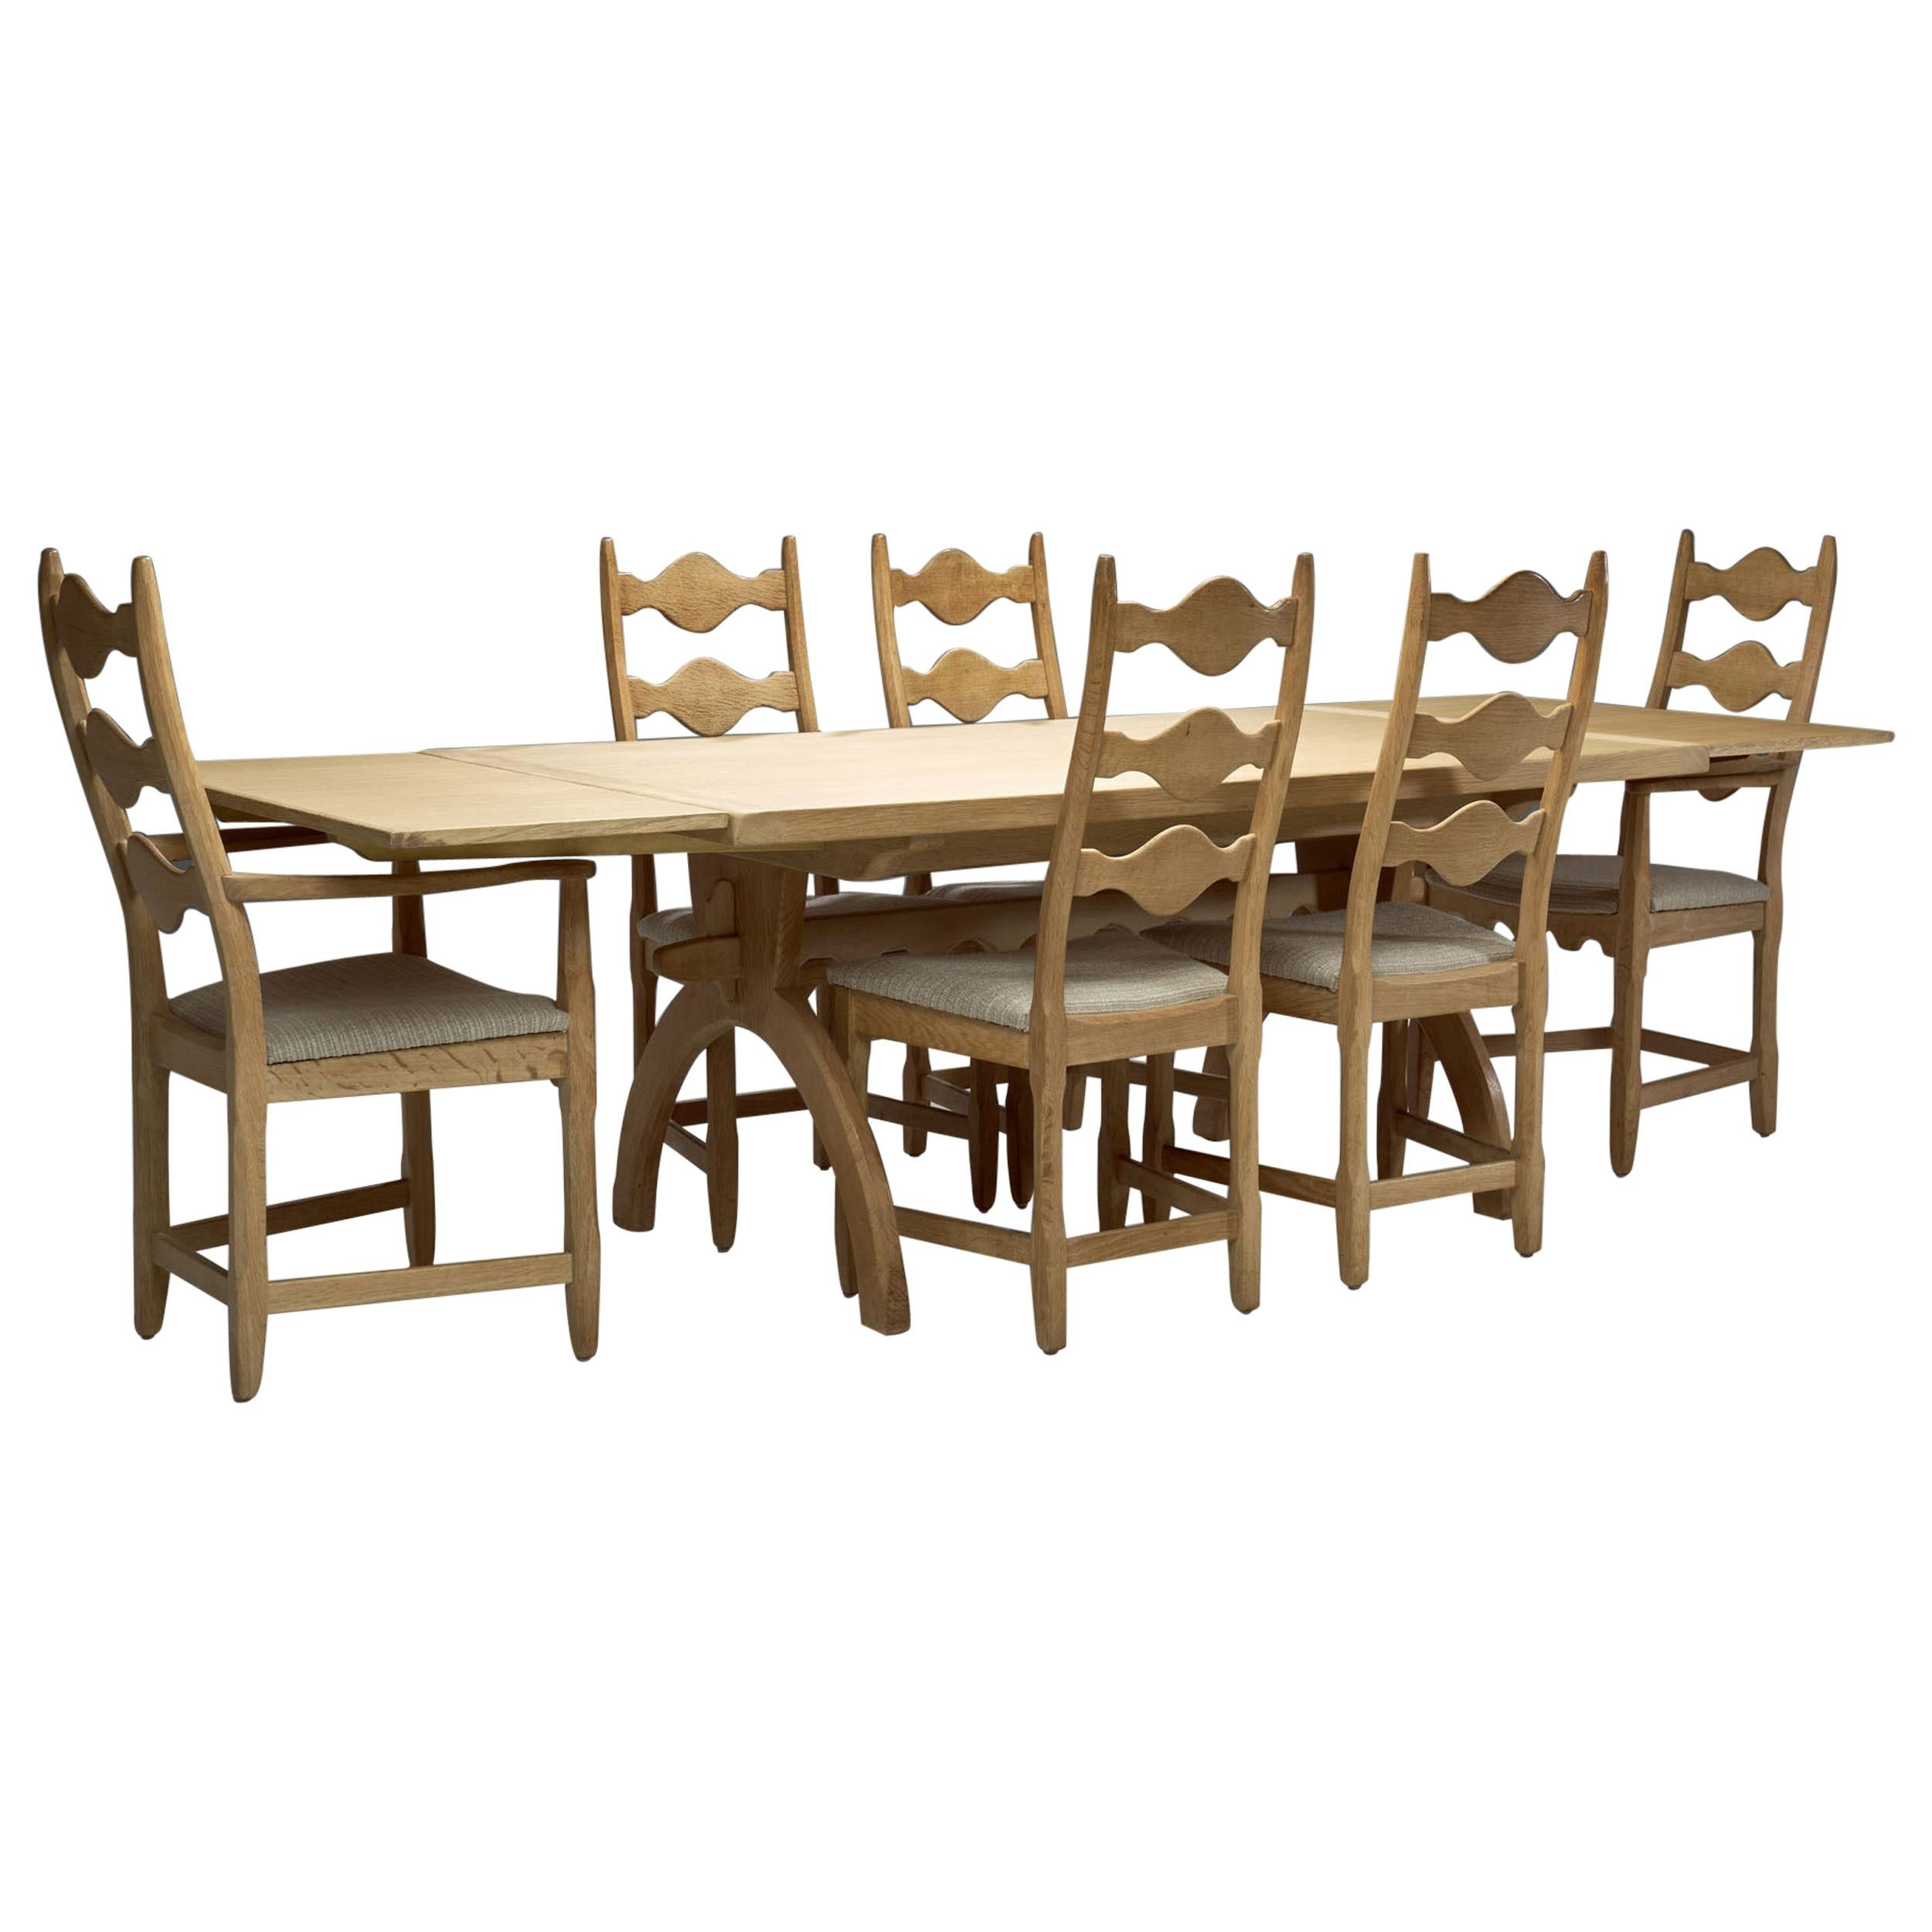 Scandinavian Oak Dining Set, Scandinavia, circa 1950s